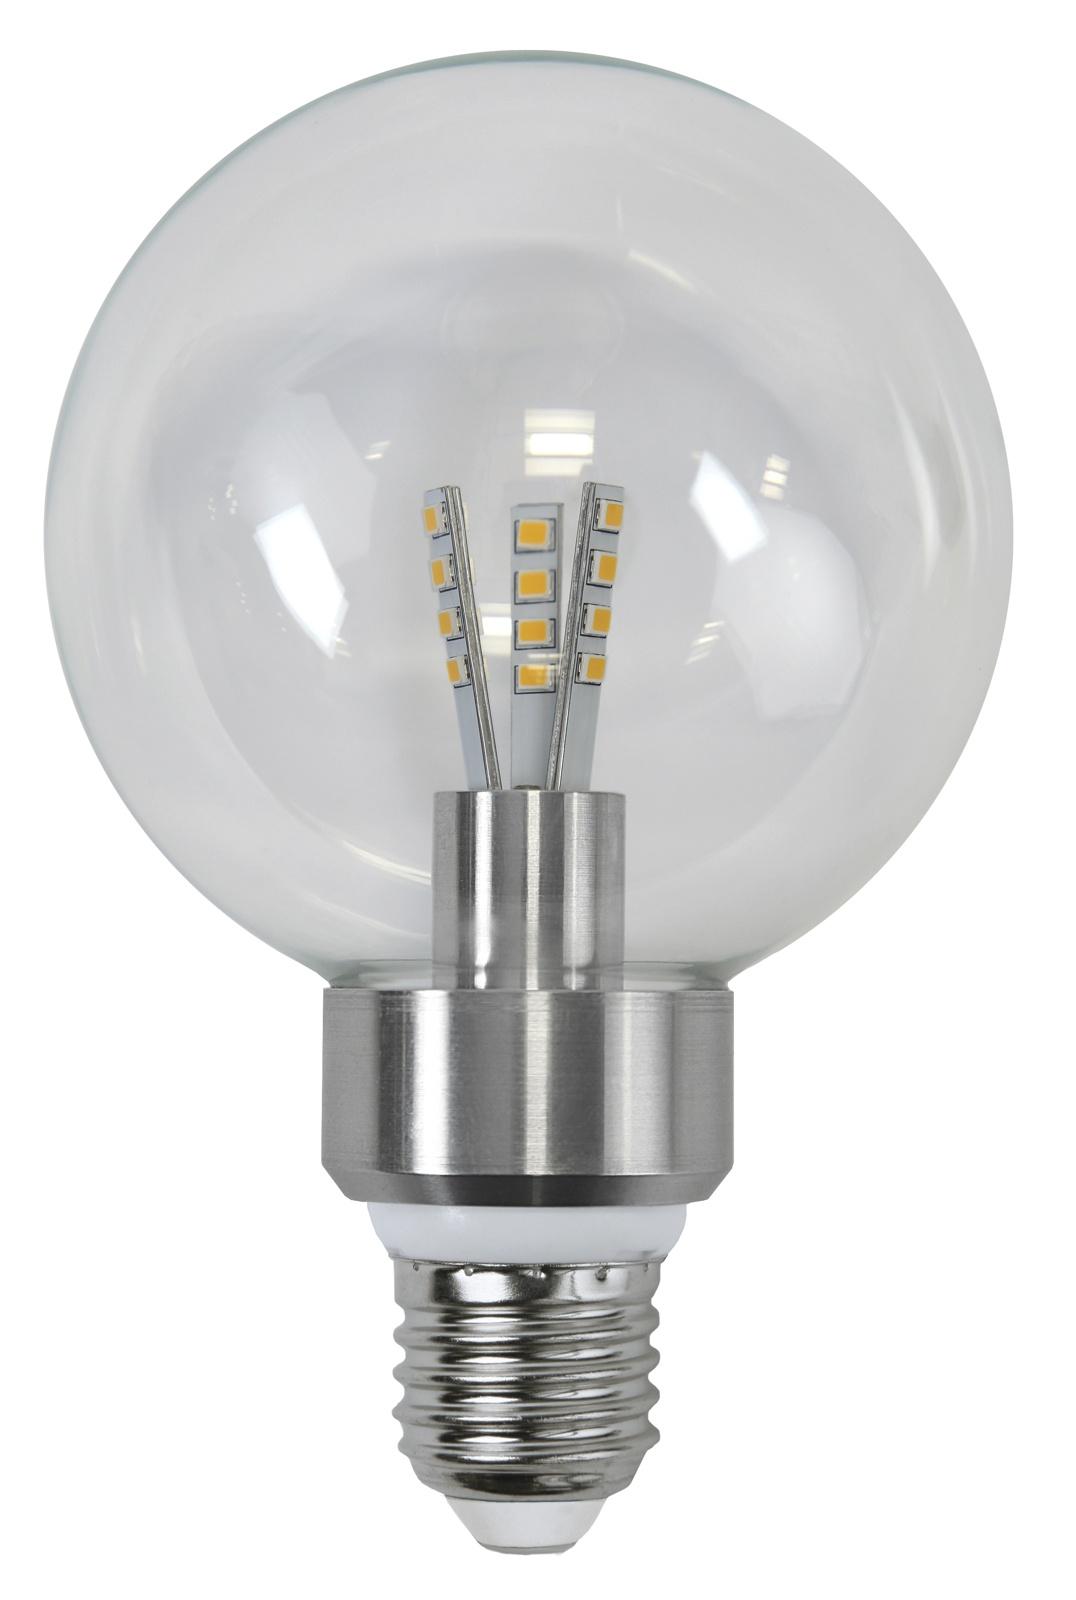 LED-lamppu Illumination LED 338-23 Ø95x145 mm E27 kirkas 5,0W 2700K 420lm himmennettävä - Taloon.com